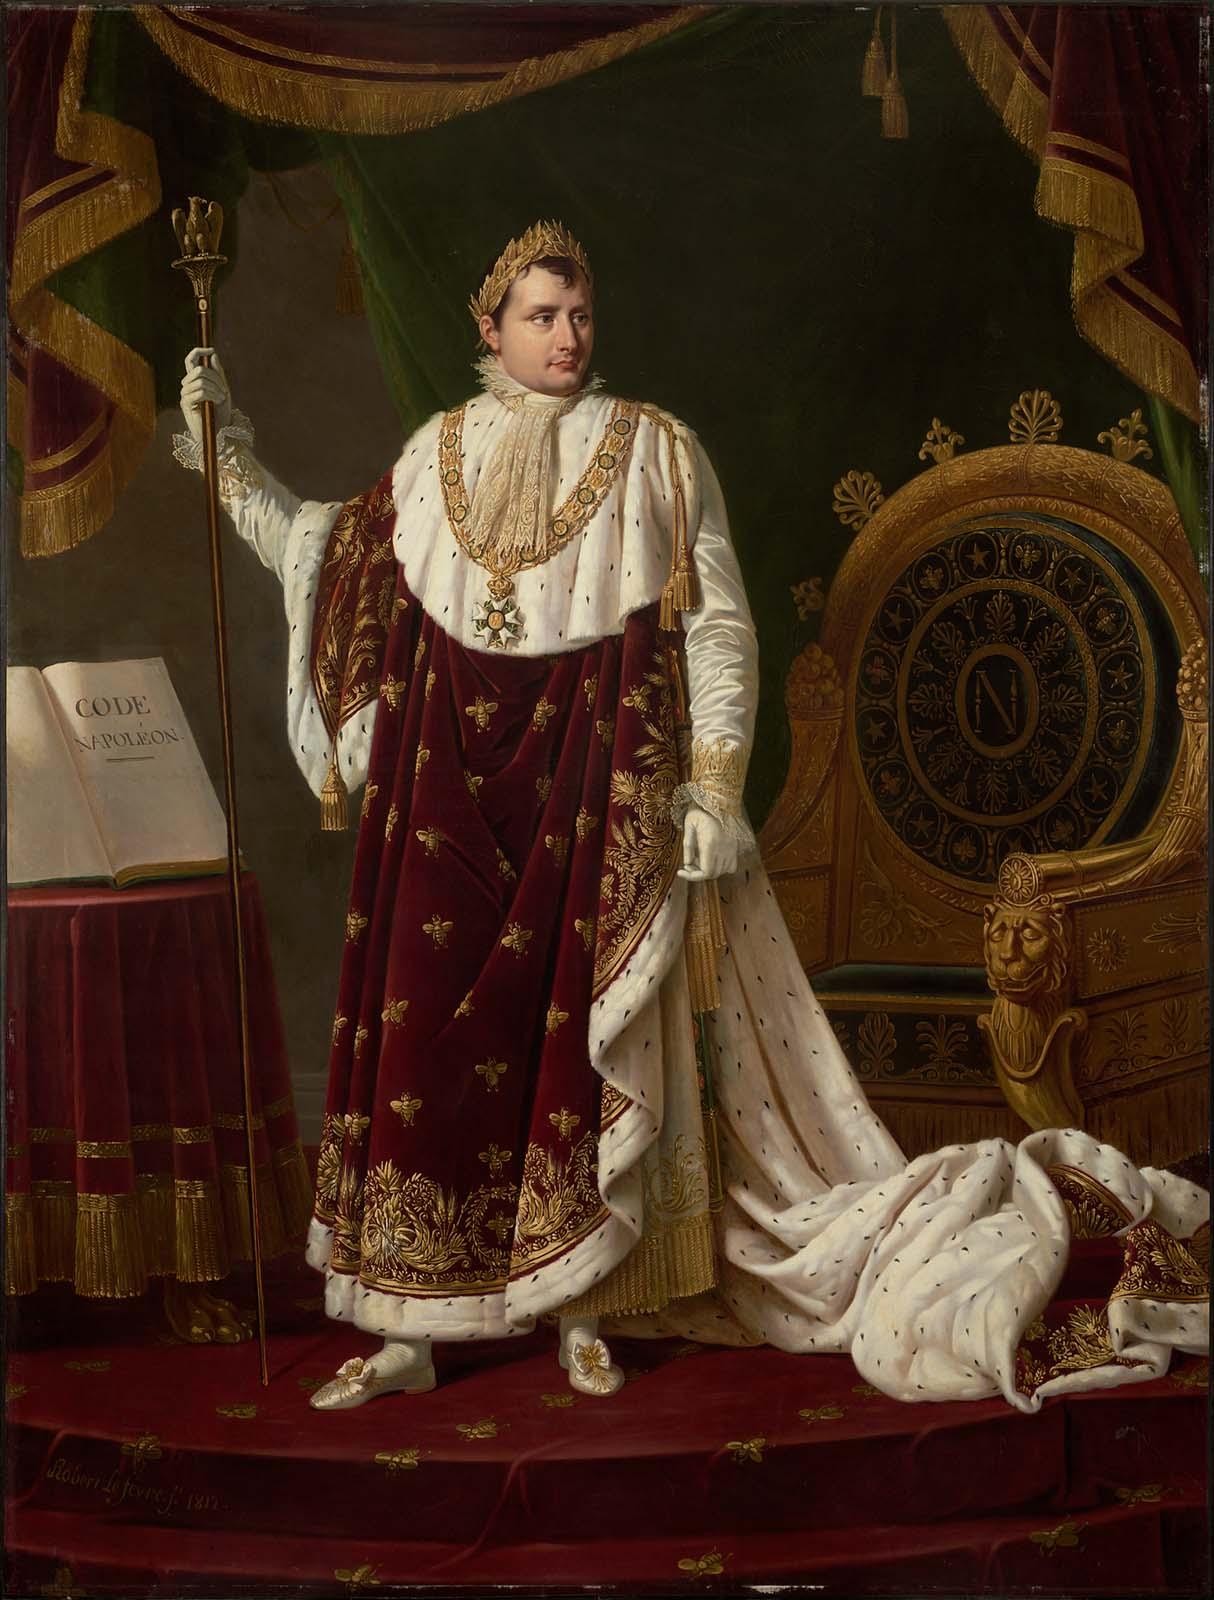 Portrait of Napoleon I in His Coronation Robe